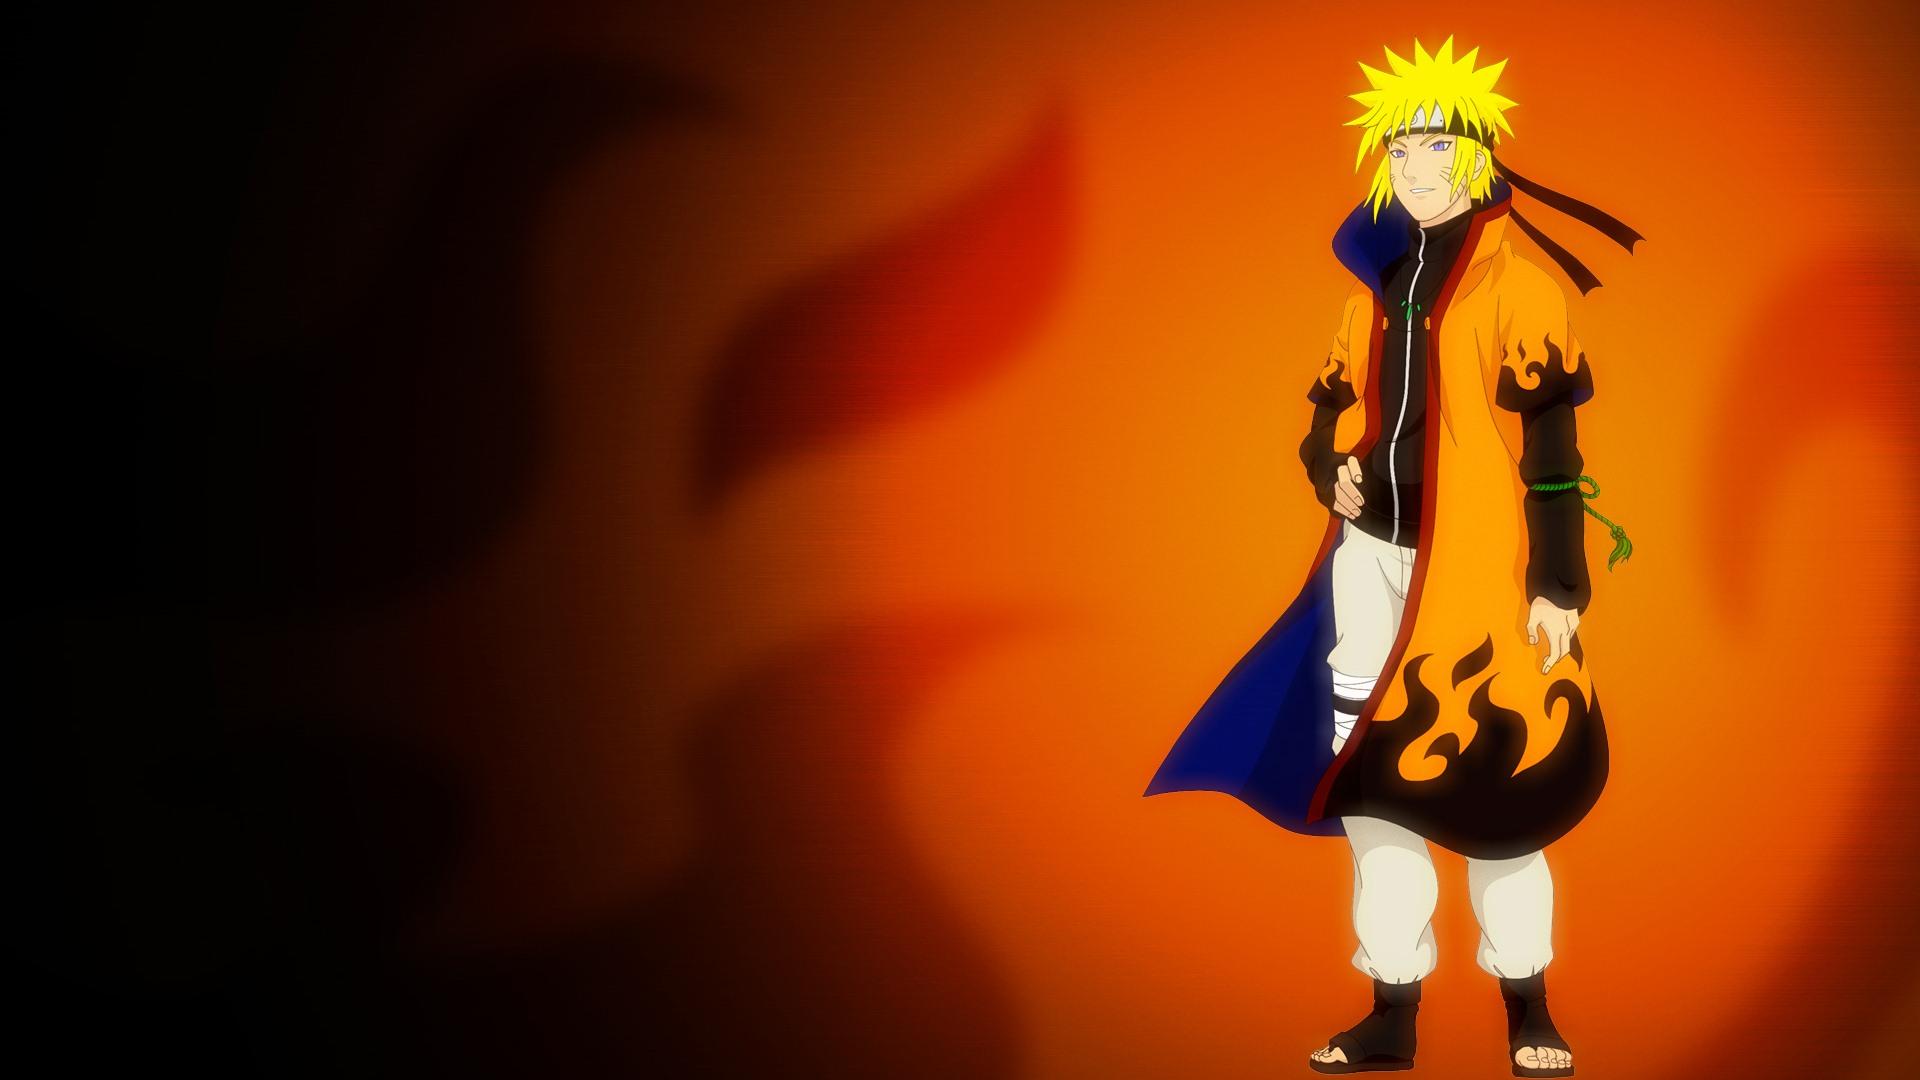 50 Naruto Hd Wallpapers For Desktop On Wallpapersafari